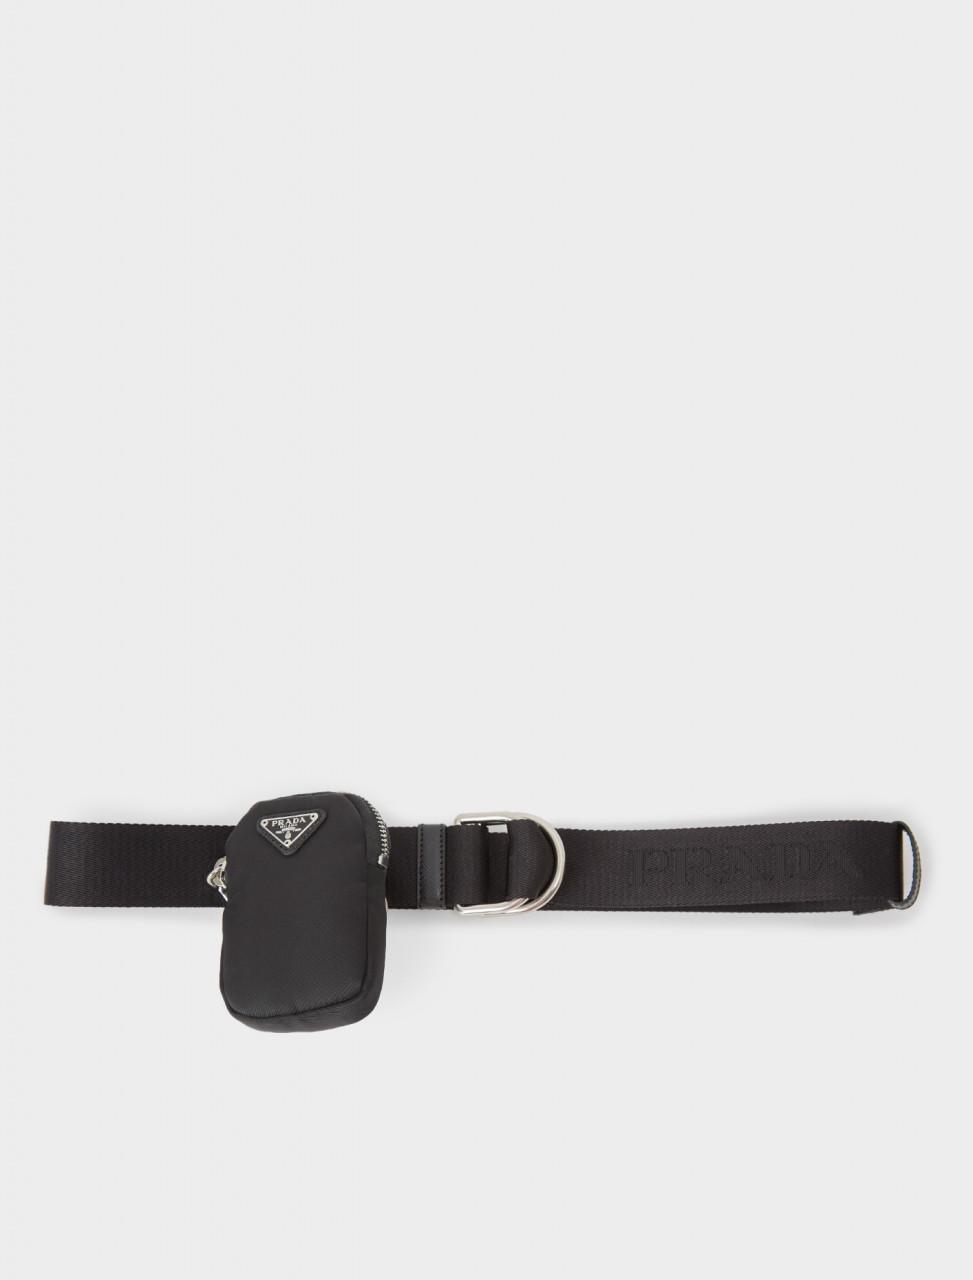 242-1CN073-2DC7-F0002 PRADA Nylon Belt with Pouch in Black